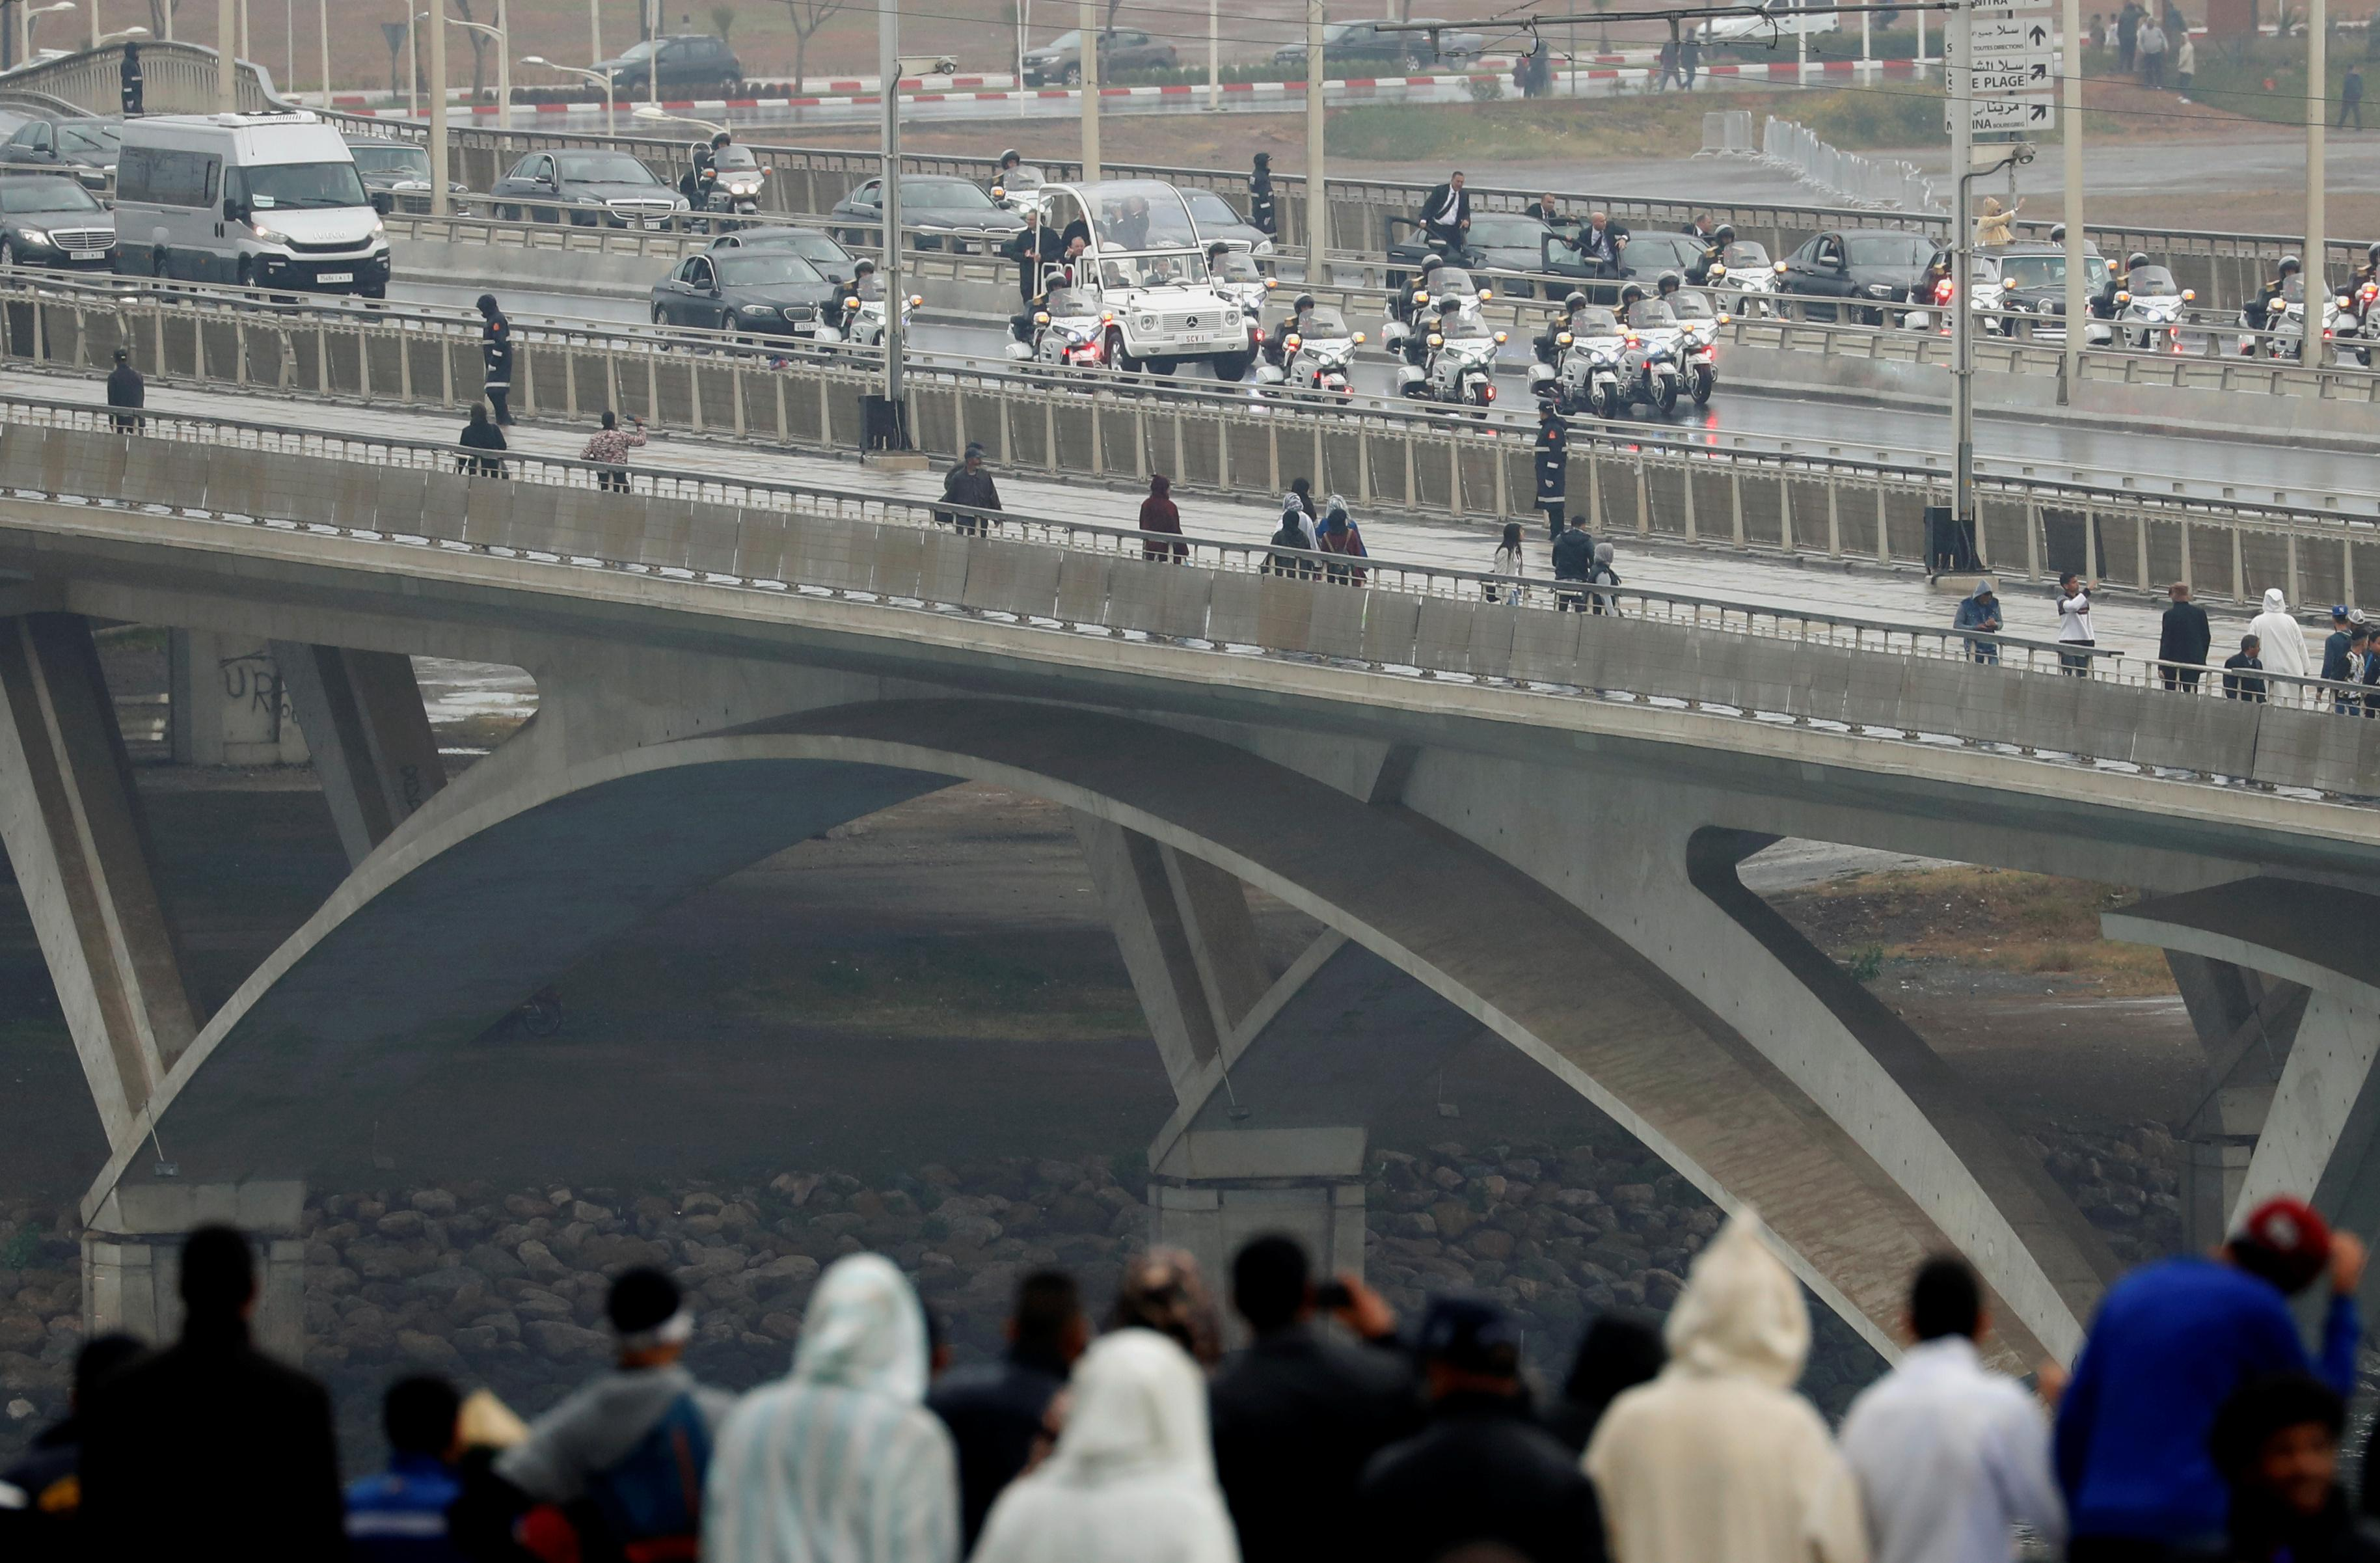 Man runs at Moroccan king's vehicle all the draw thru pope visit: TV